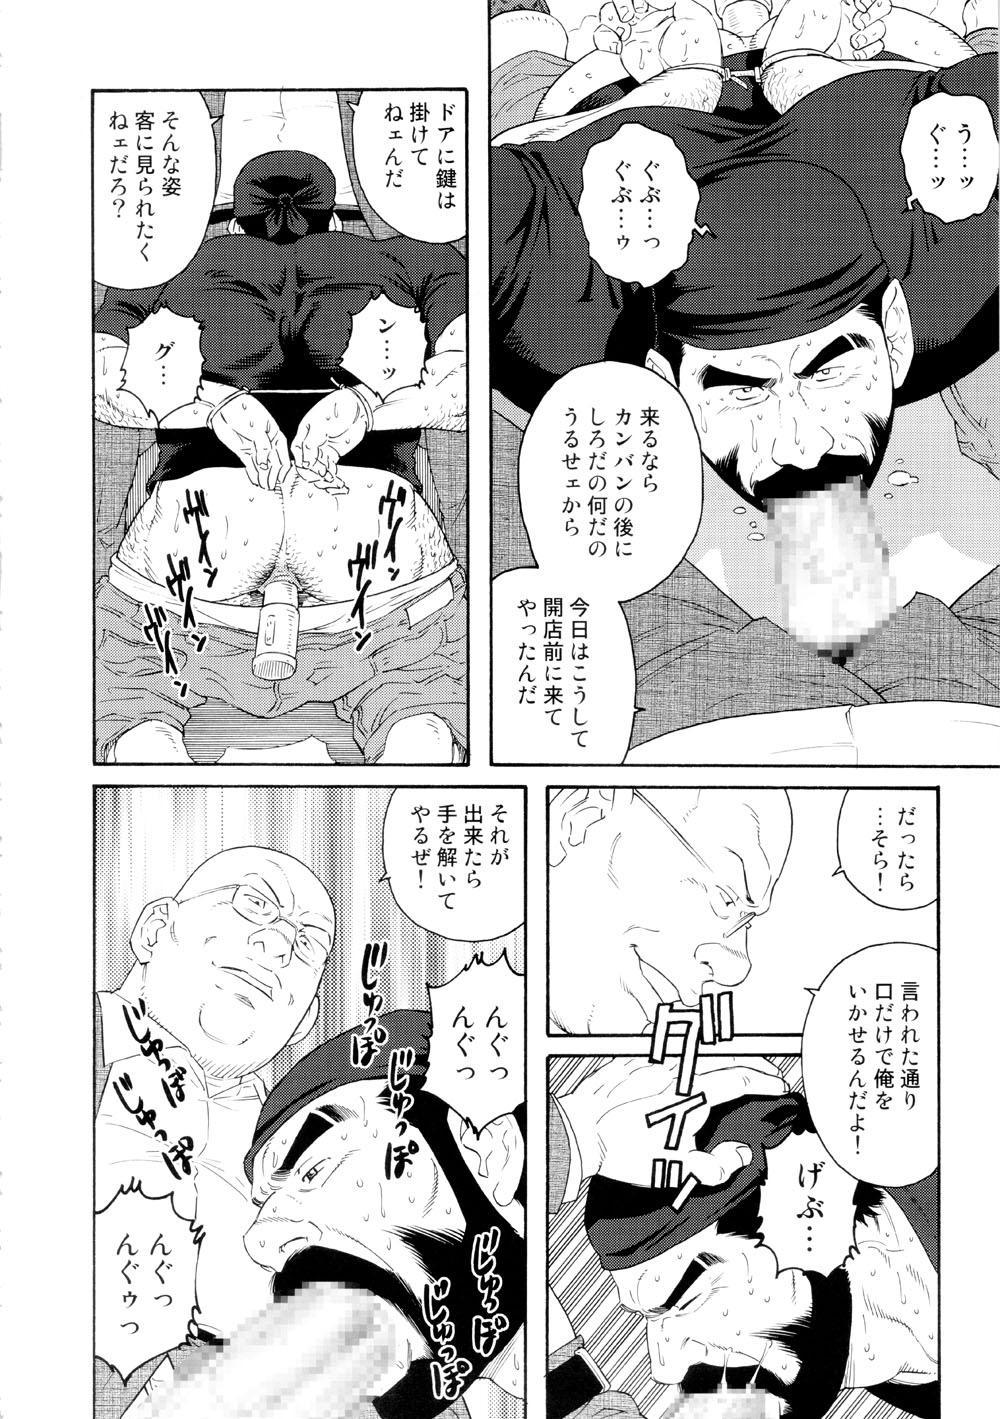 Genryu Chapter 3 1